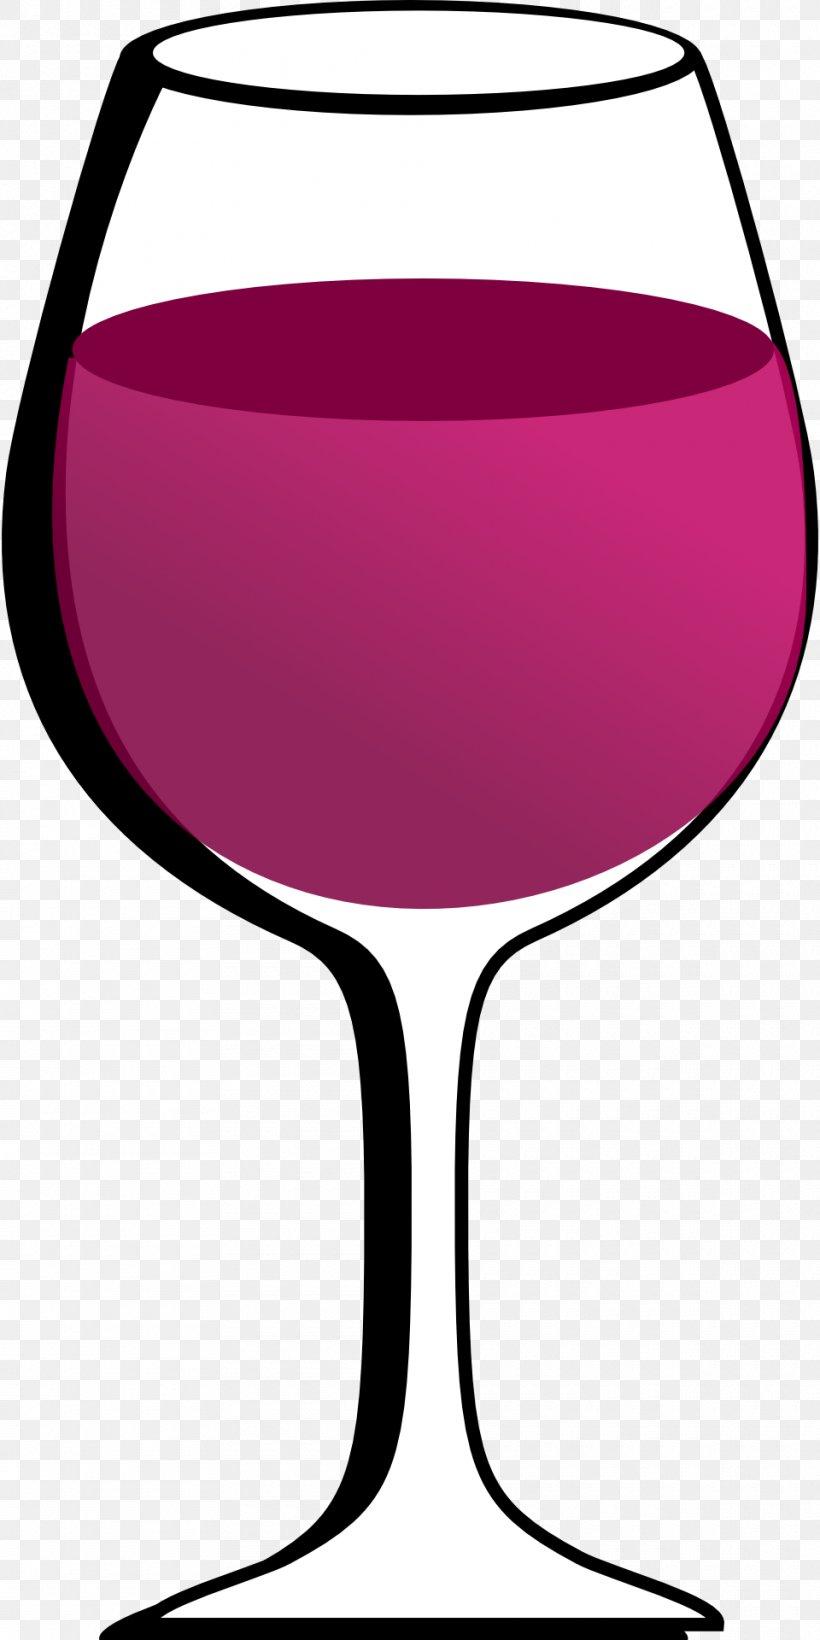 Wine Glass Champagne Glass Clip Art, PNG, 960x1920px, Wine.